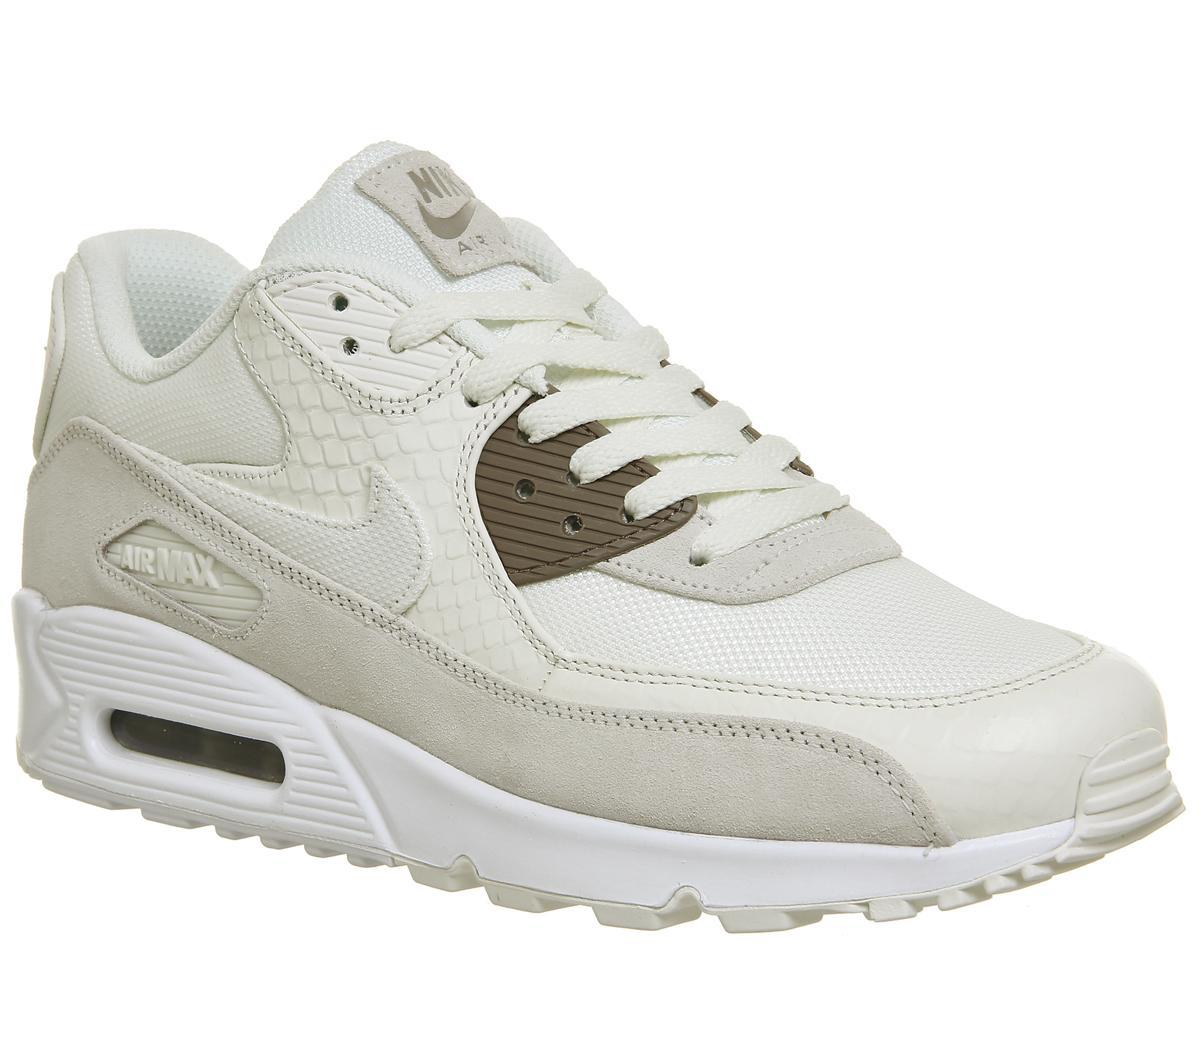 Nike Air Max 90 Premium Mens SailSepia StoneWhite Shoes UK